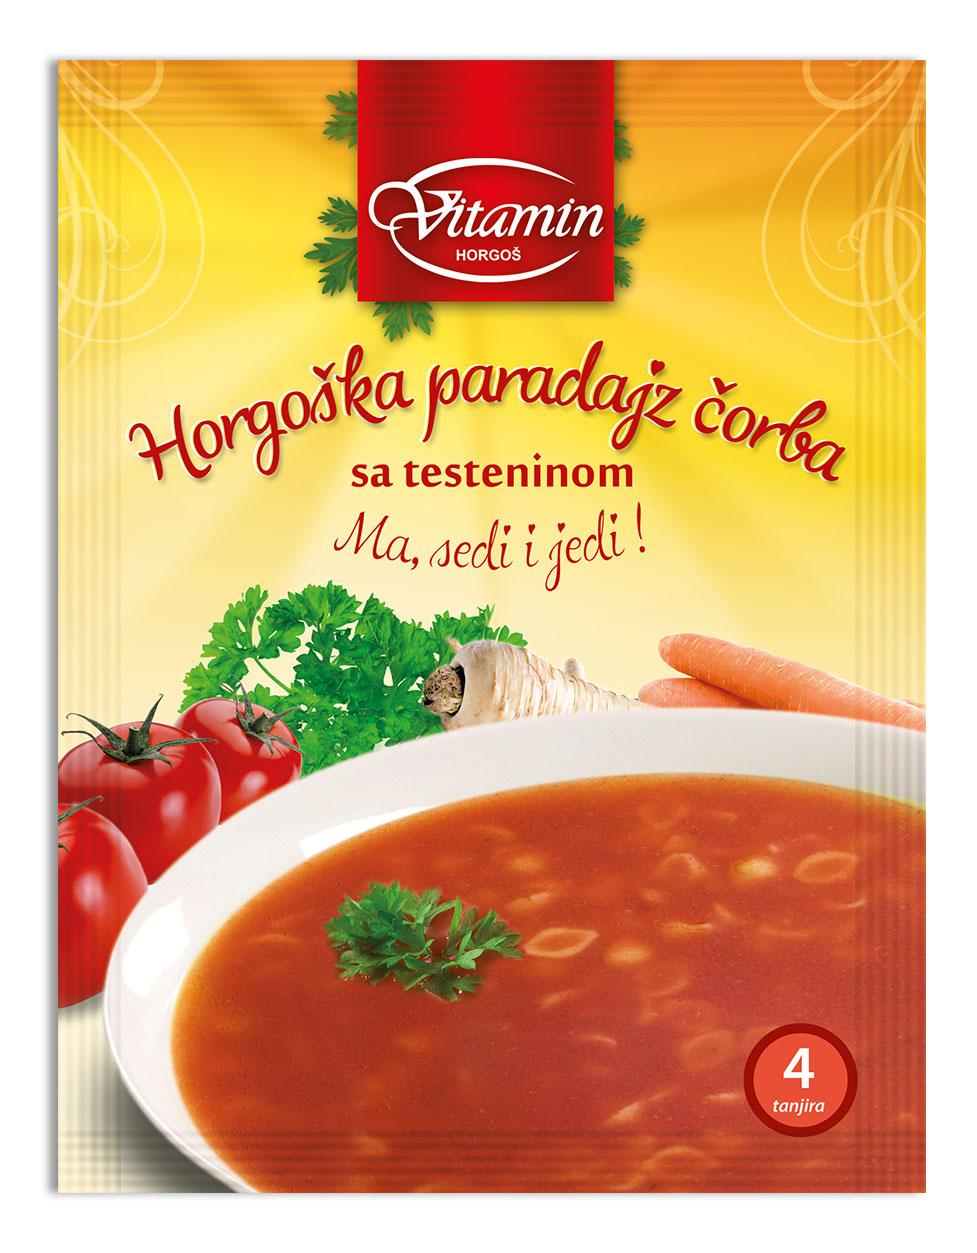 vitamin pakovanje 3